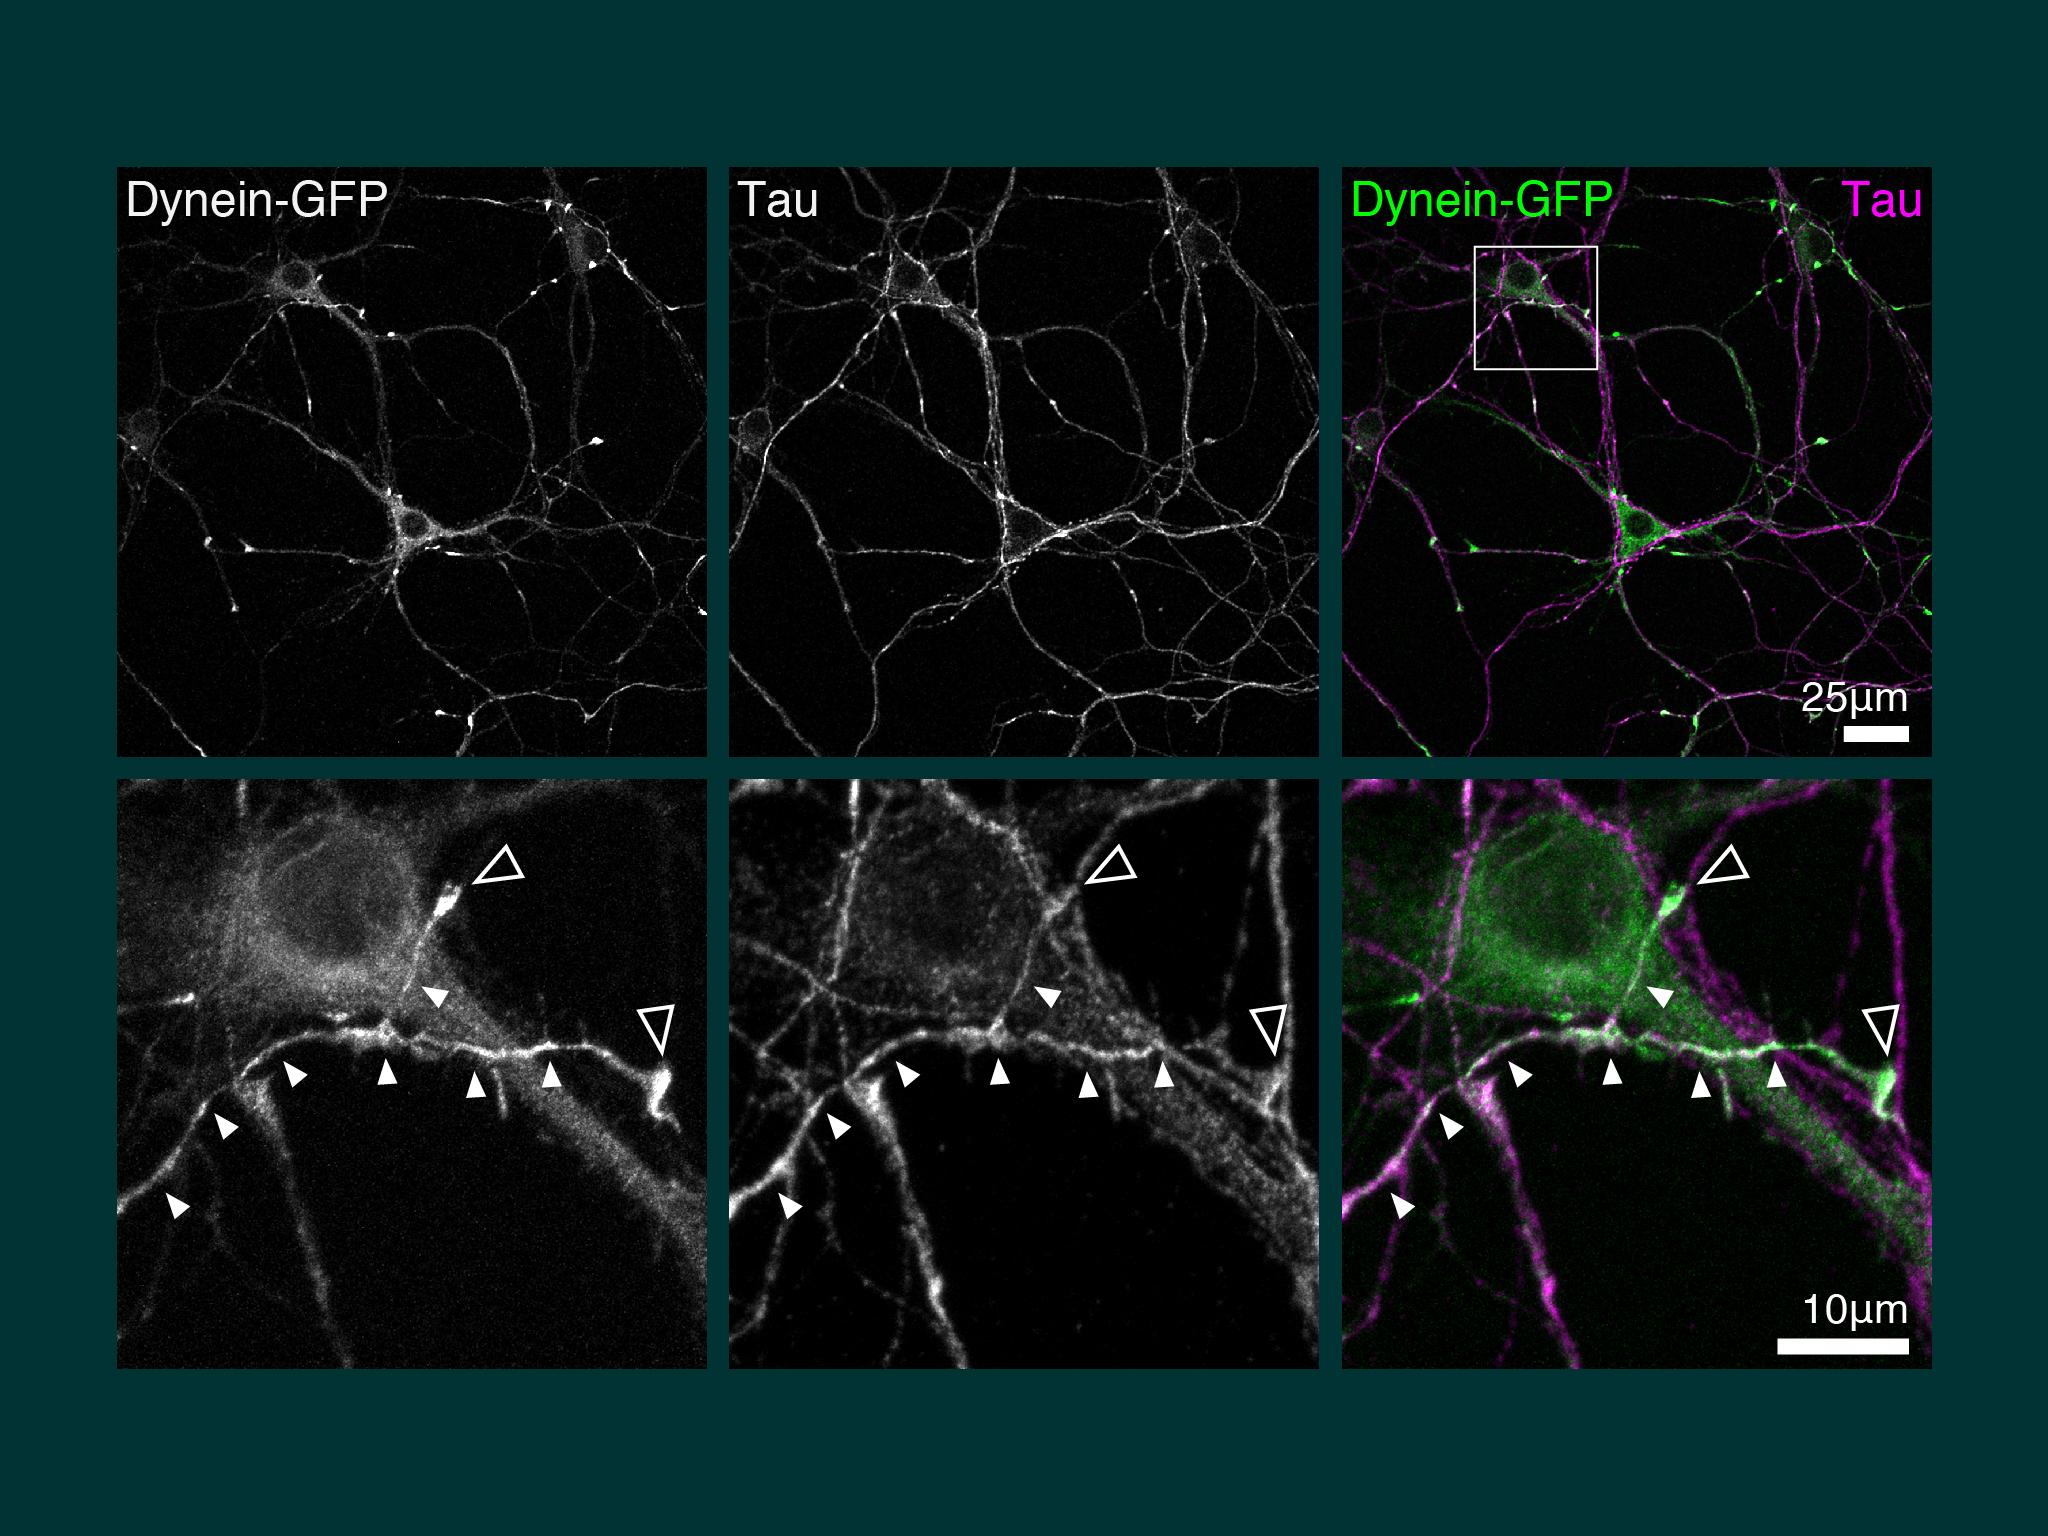 Dynein accumulates in the distal axon